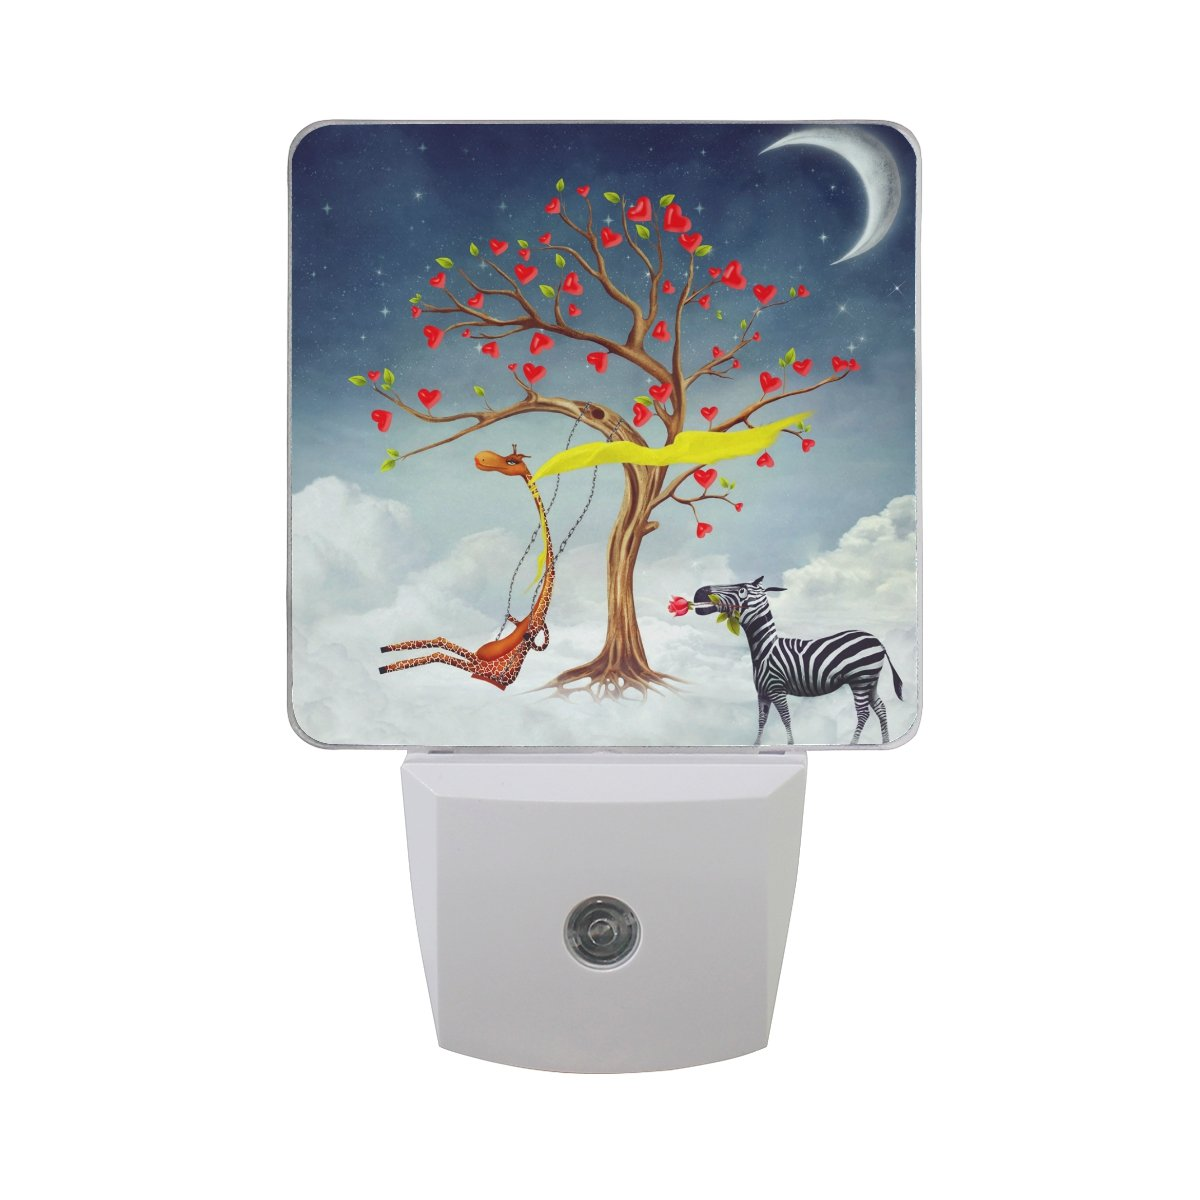 JOYPRINT Led Night Light Romantic Giraffe Zebra Flower Tree, Auto Senor Dusk to Dawn Night Light Plug in for Kids Baby Girls Boys Adults Room